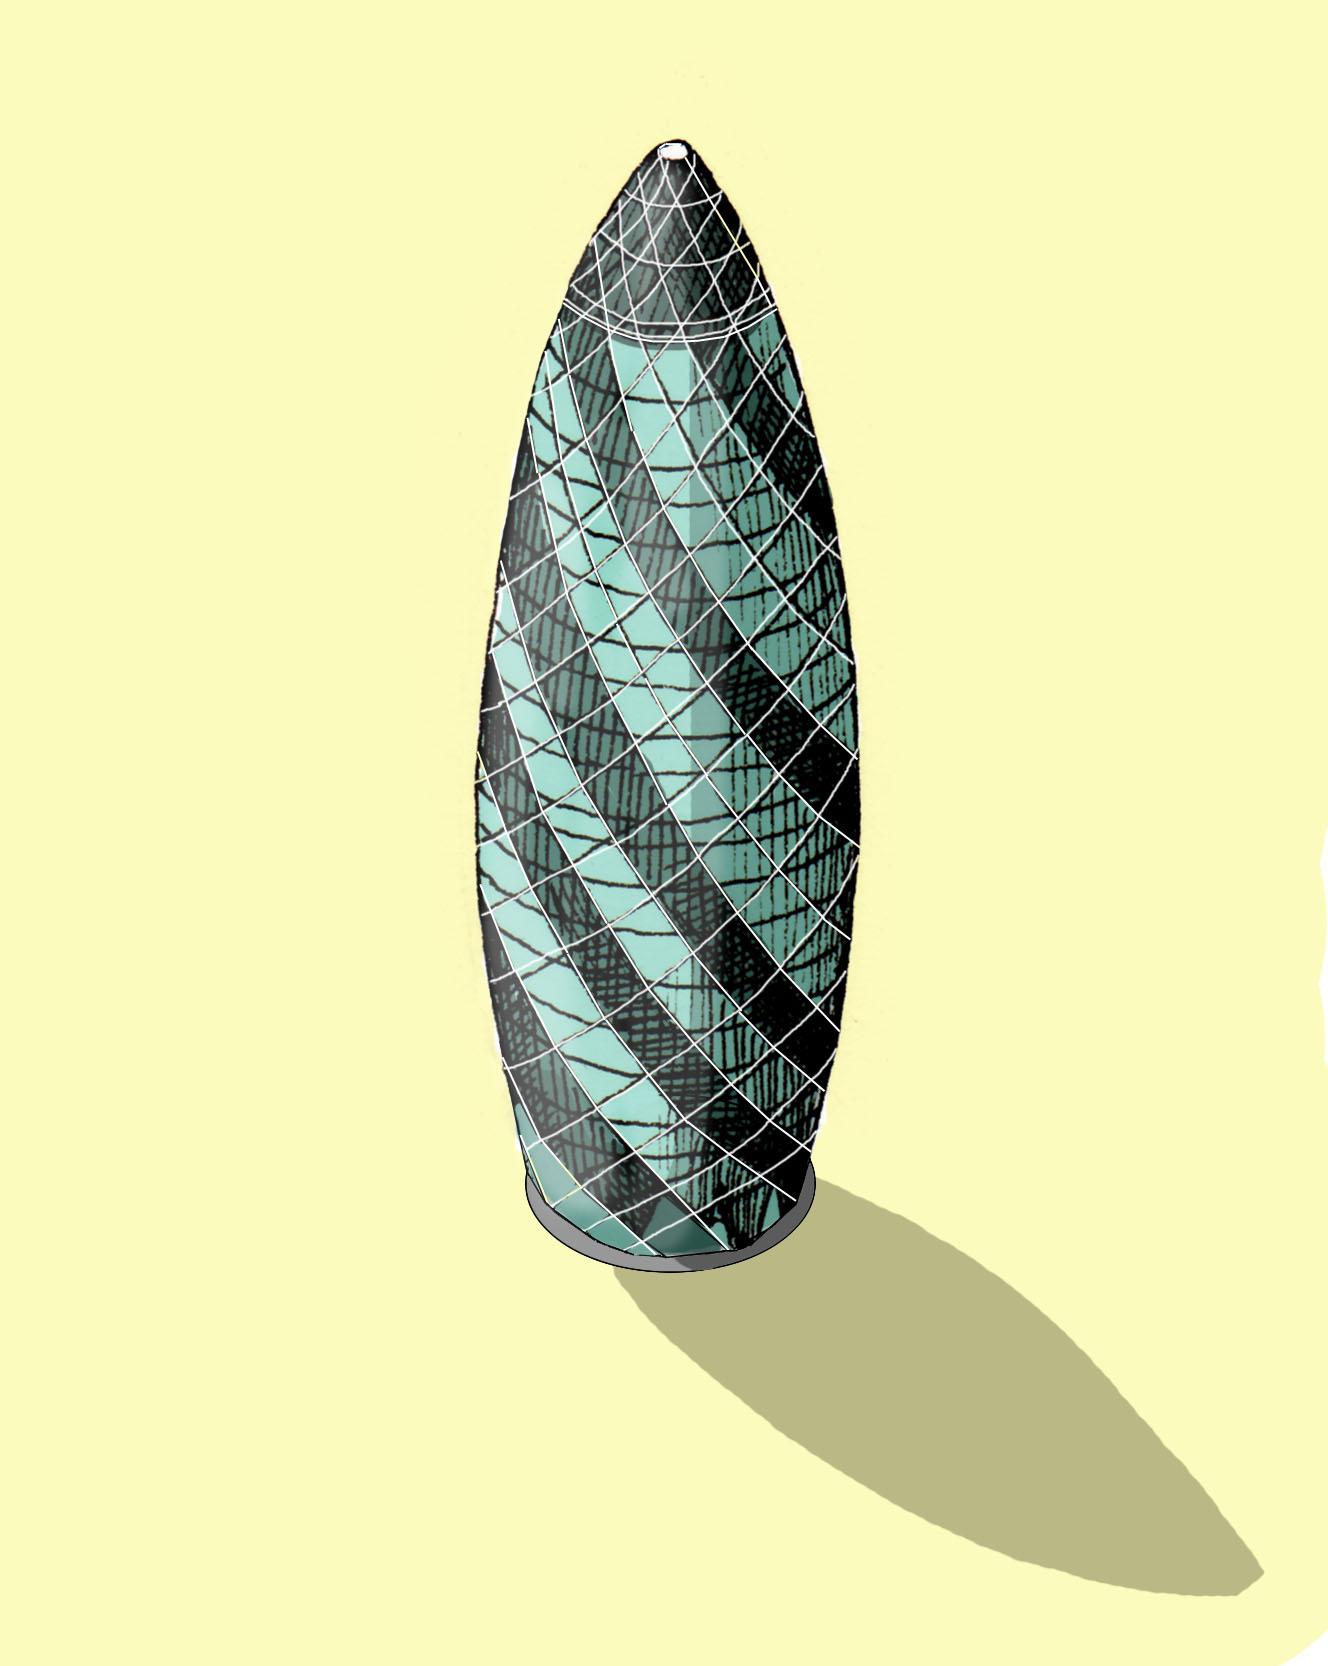 The Gherkin  Illustration by Katherine Baxter